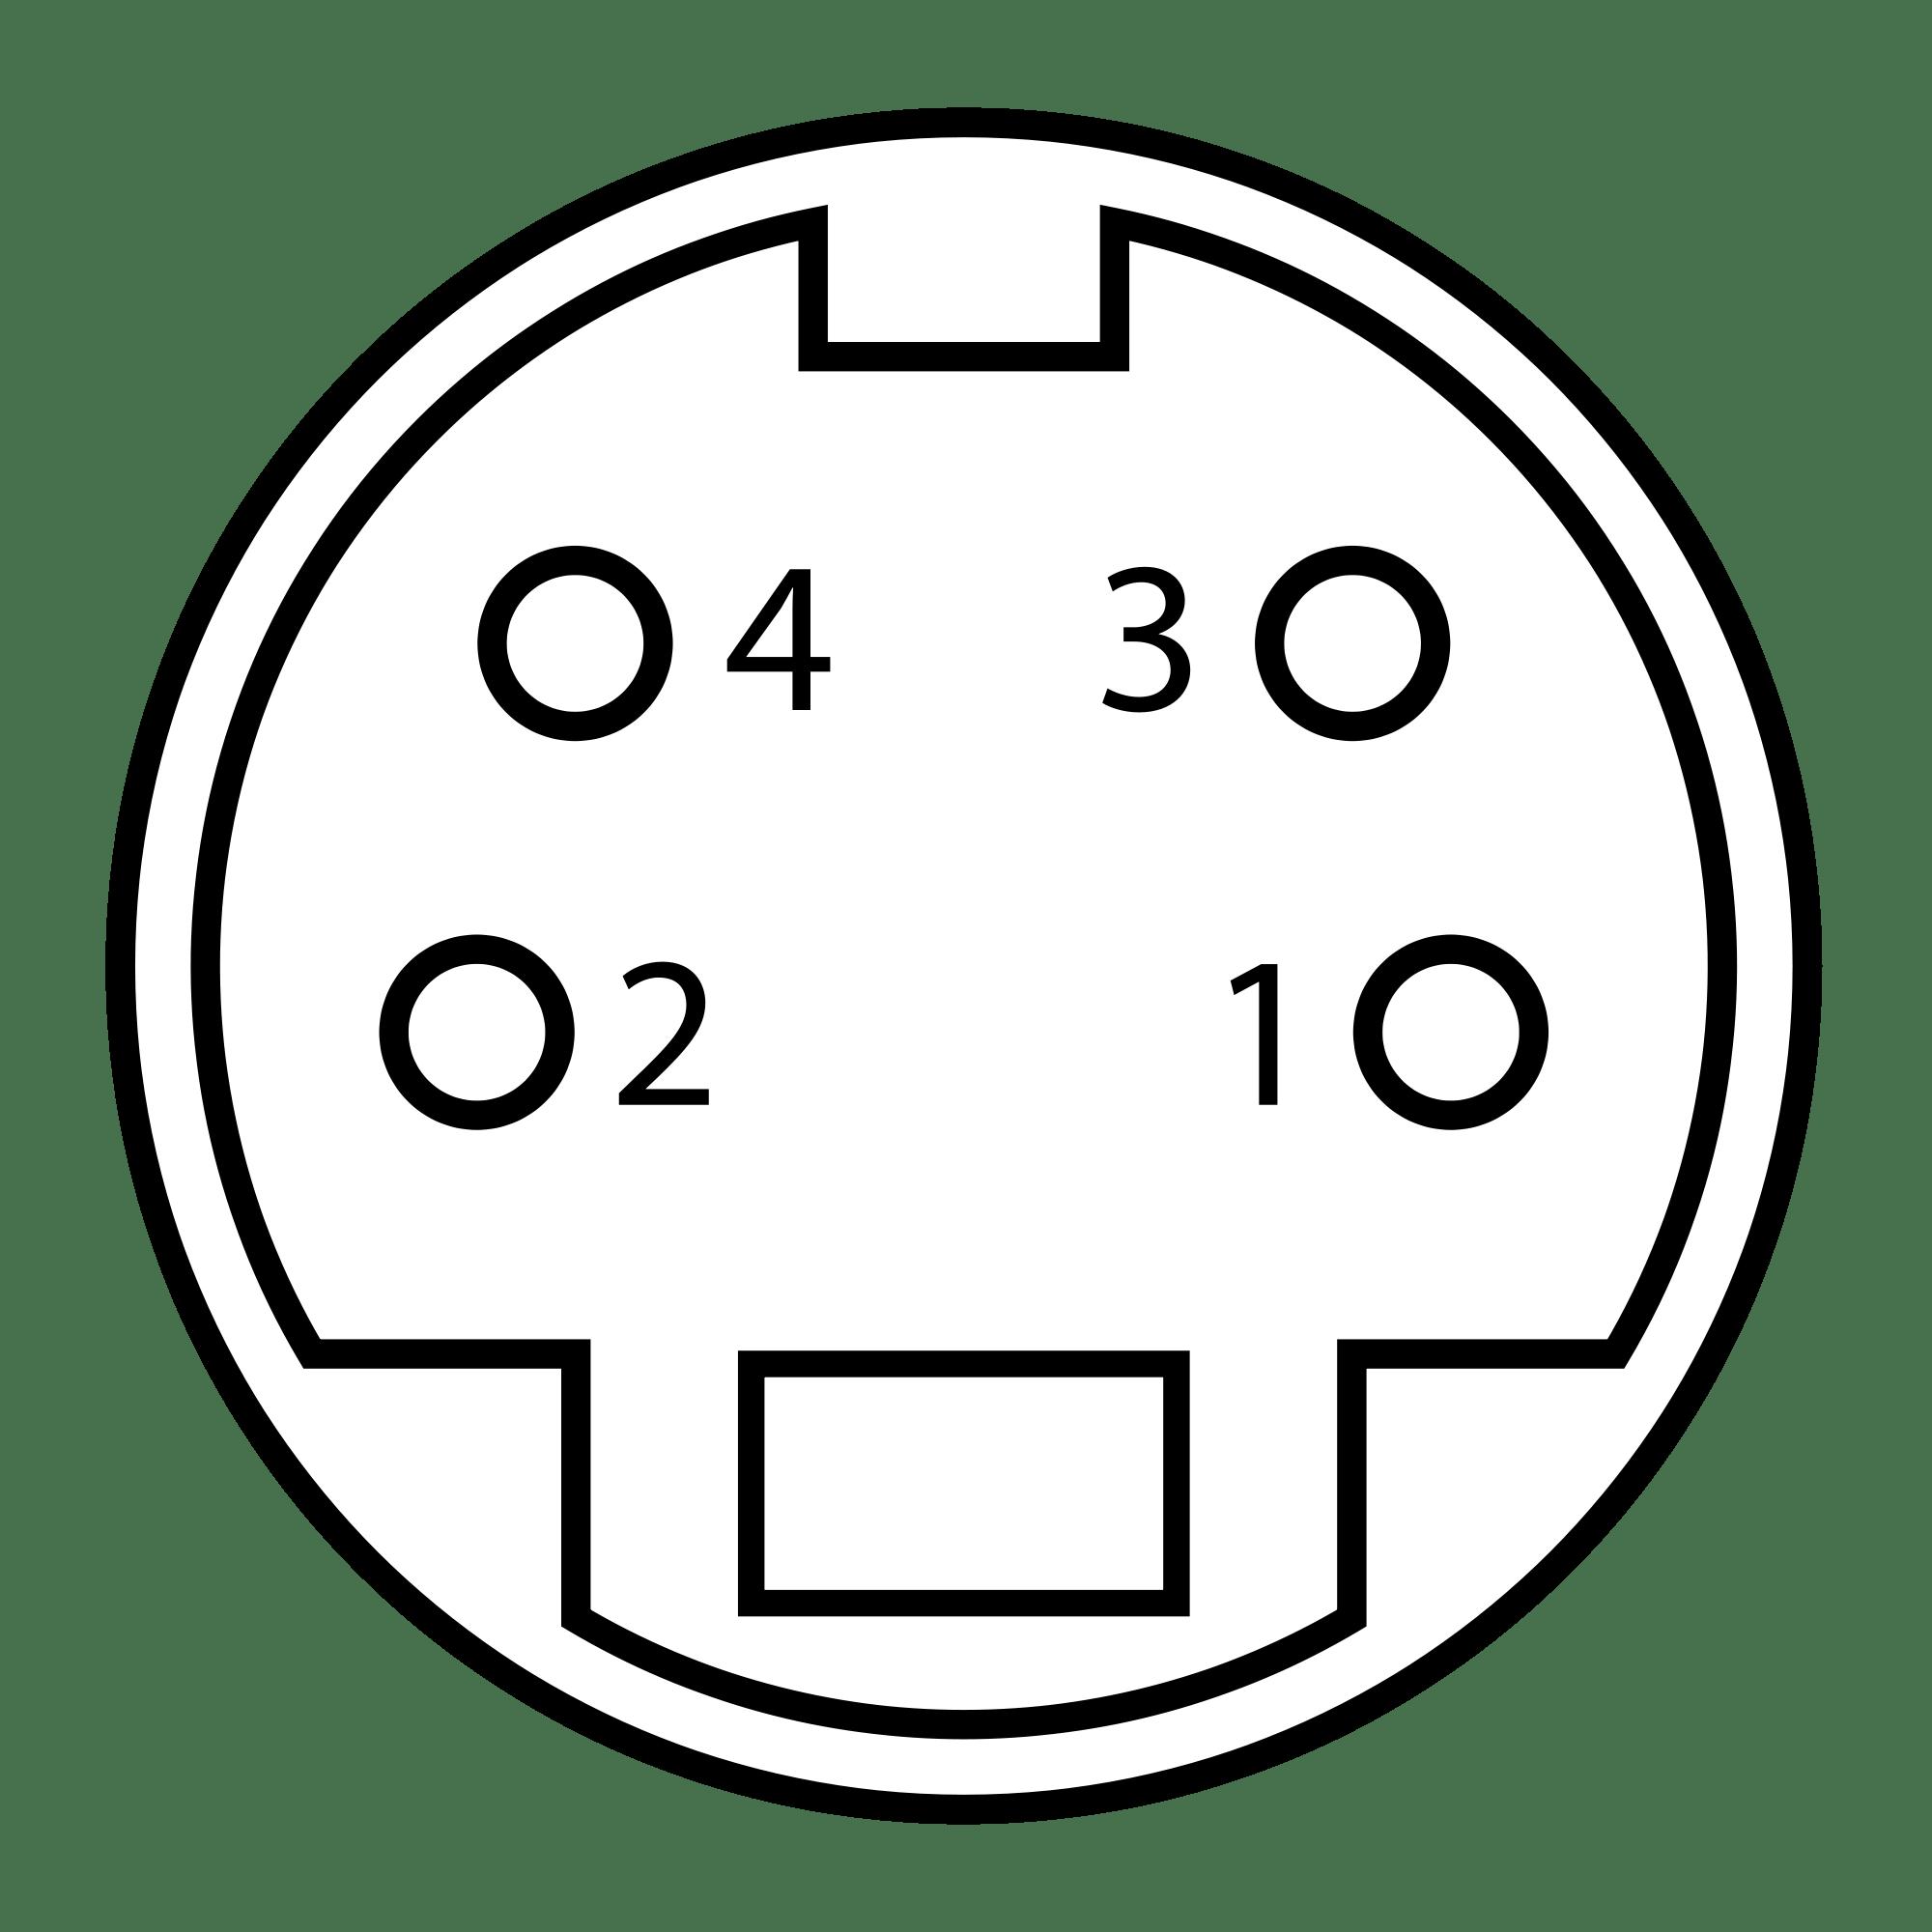 Usb Wiring Diagram Wiki